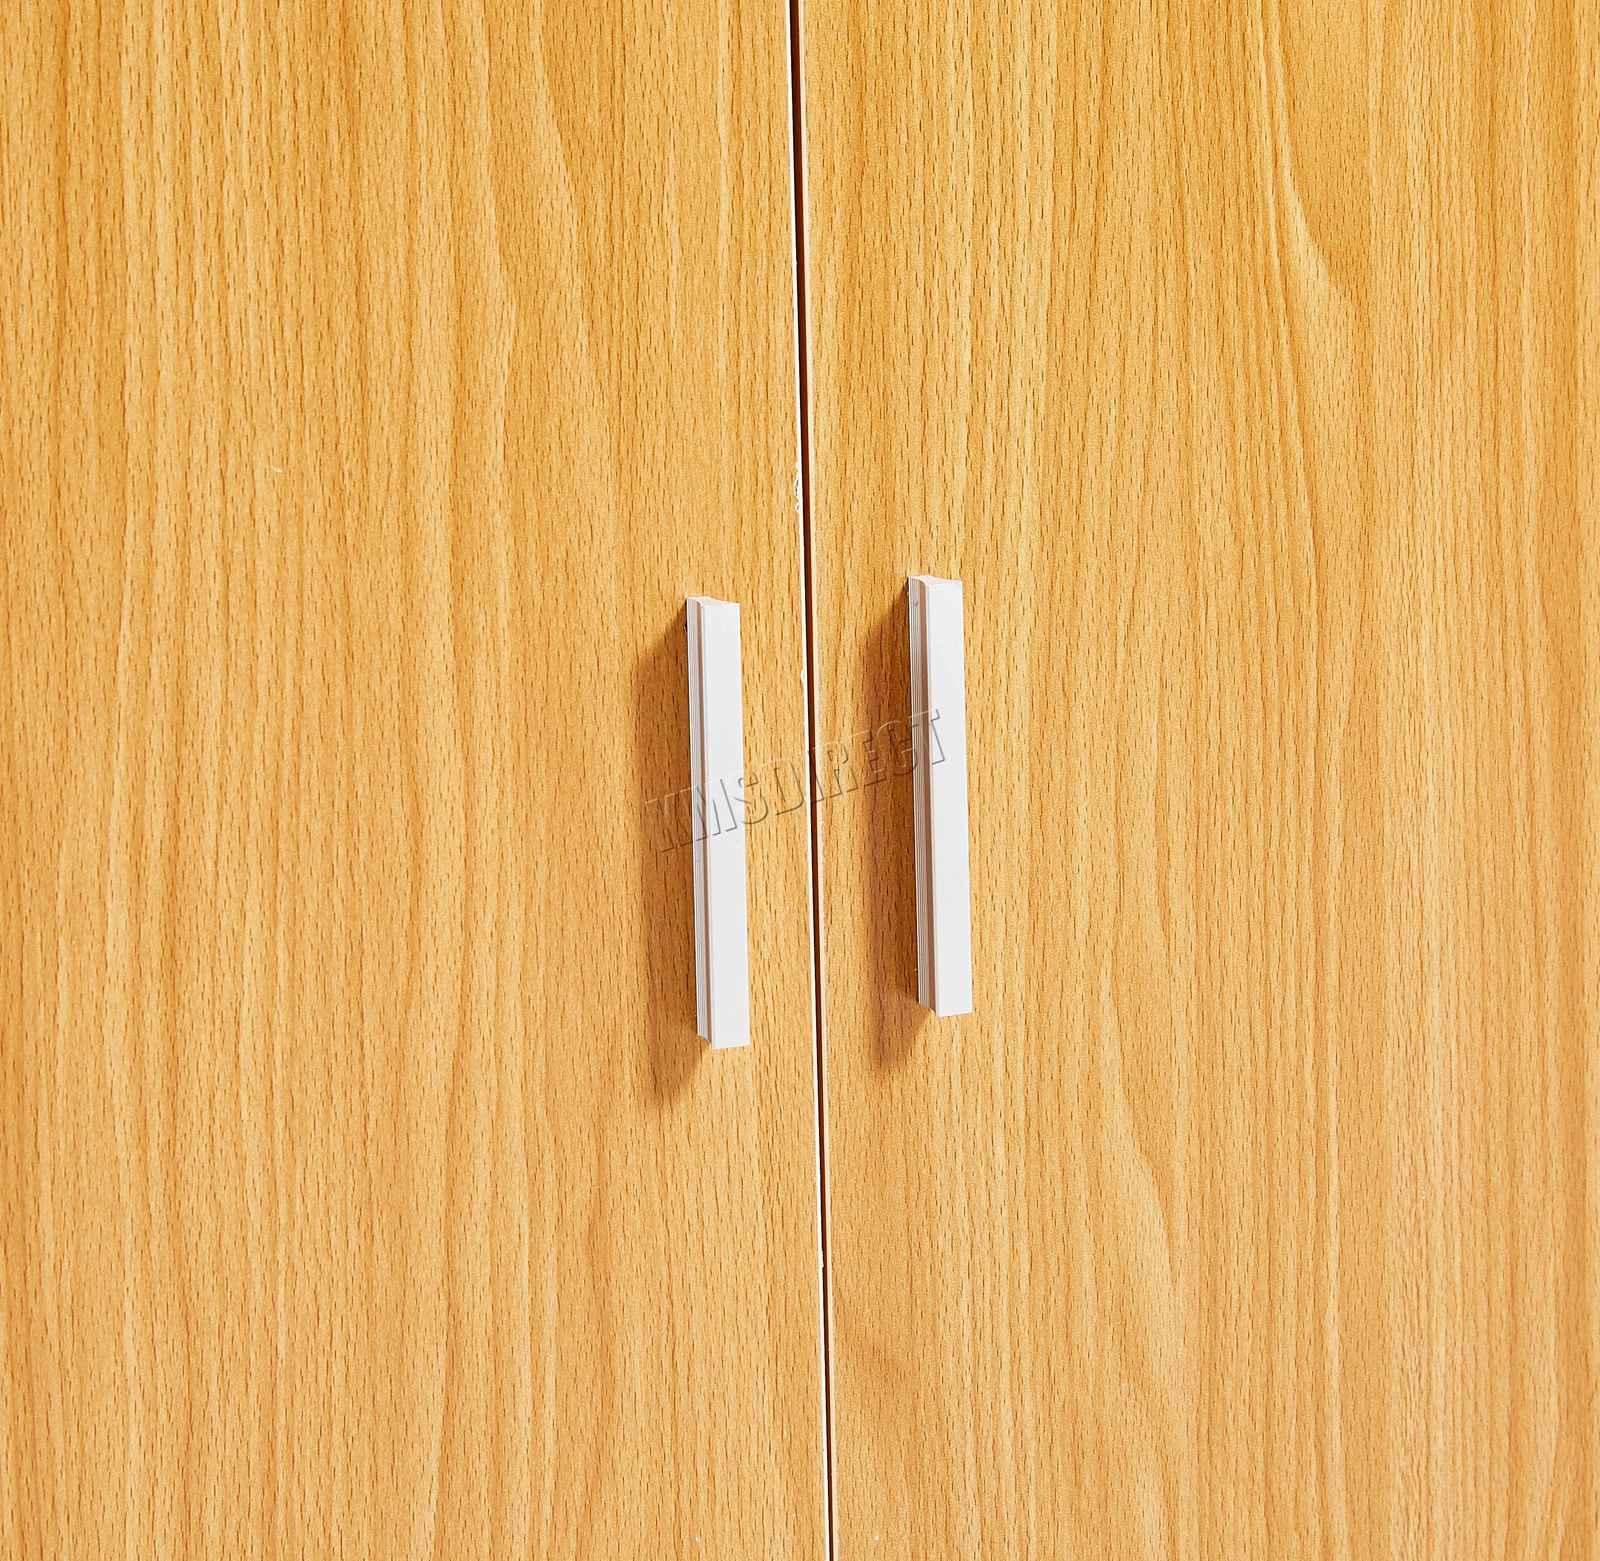 WestWood-Sideboard-Cabinet-Storage-tableware-Kitchen-Cupboard-Unit-PB-SSP01-NEW thumbnail 20